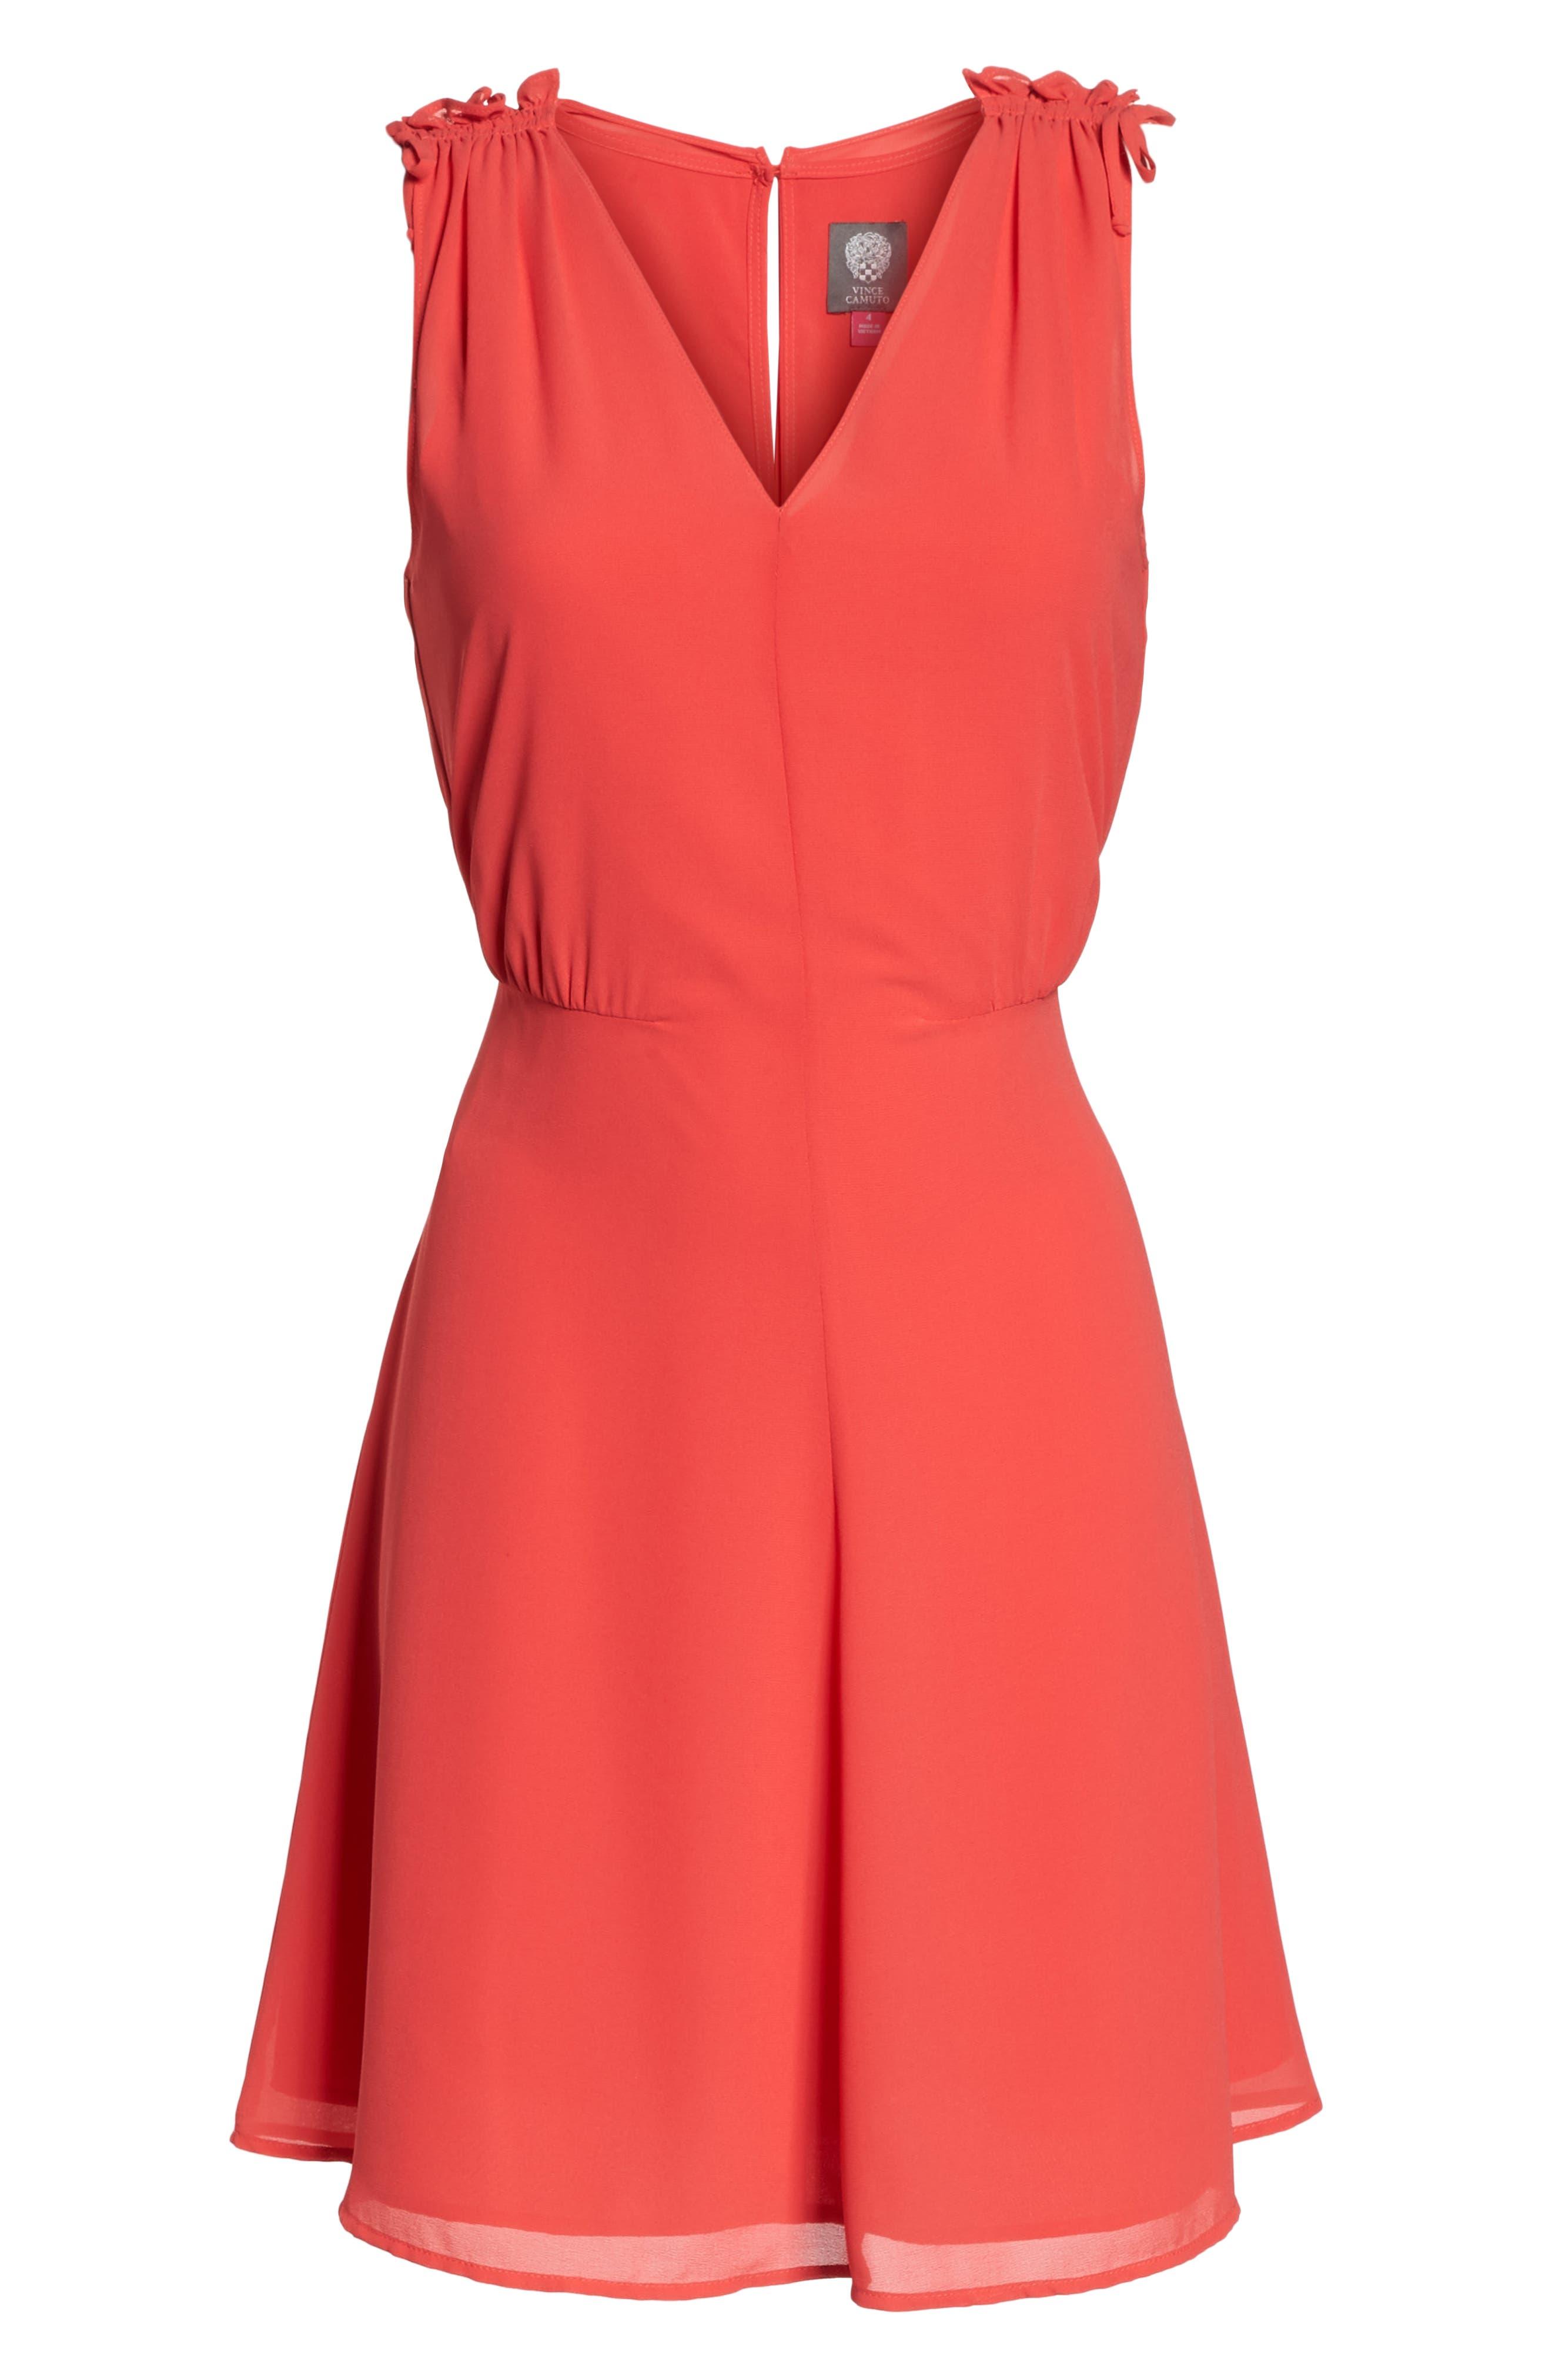 Soufflé V-Neck Chiffon Dress,                             Alternate thumbnail 7, color,                             STRAWBERRY